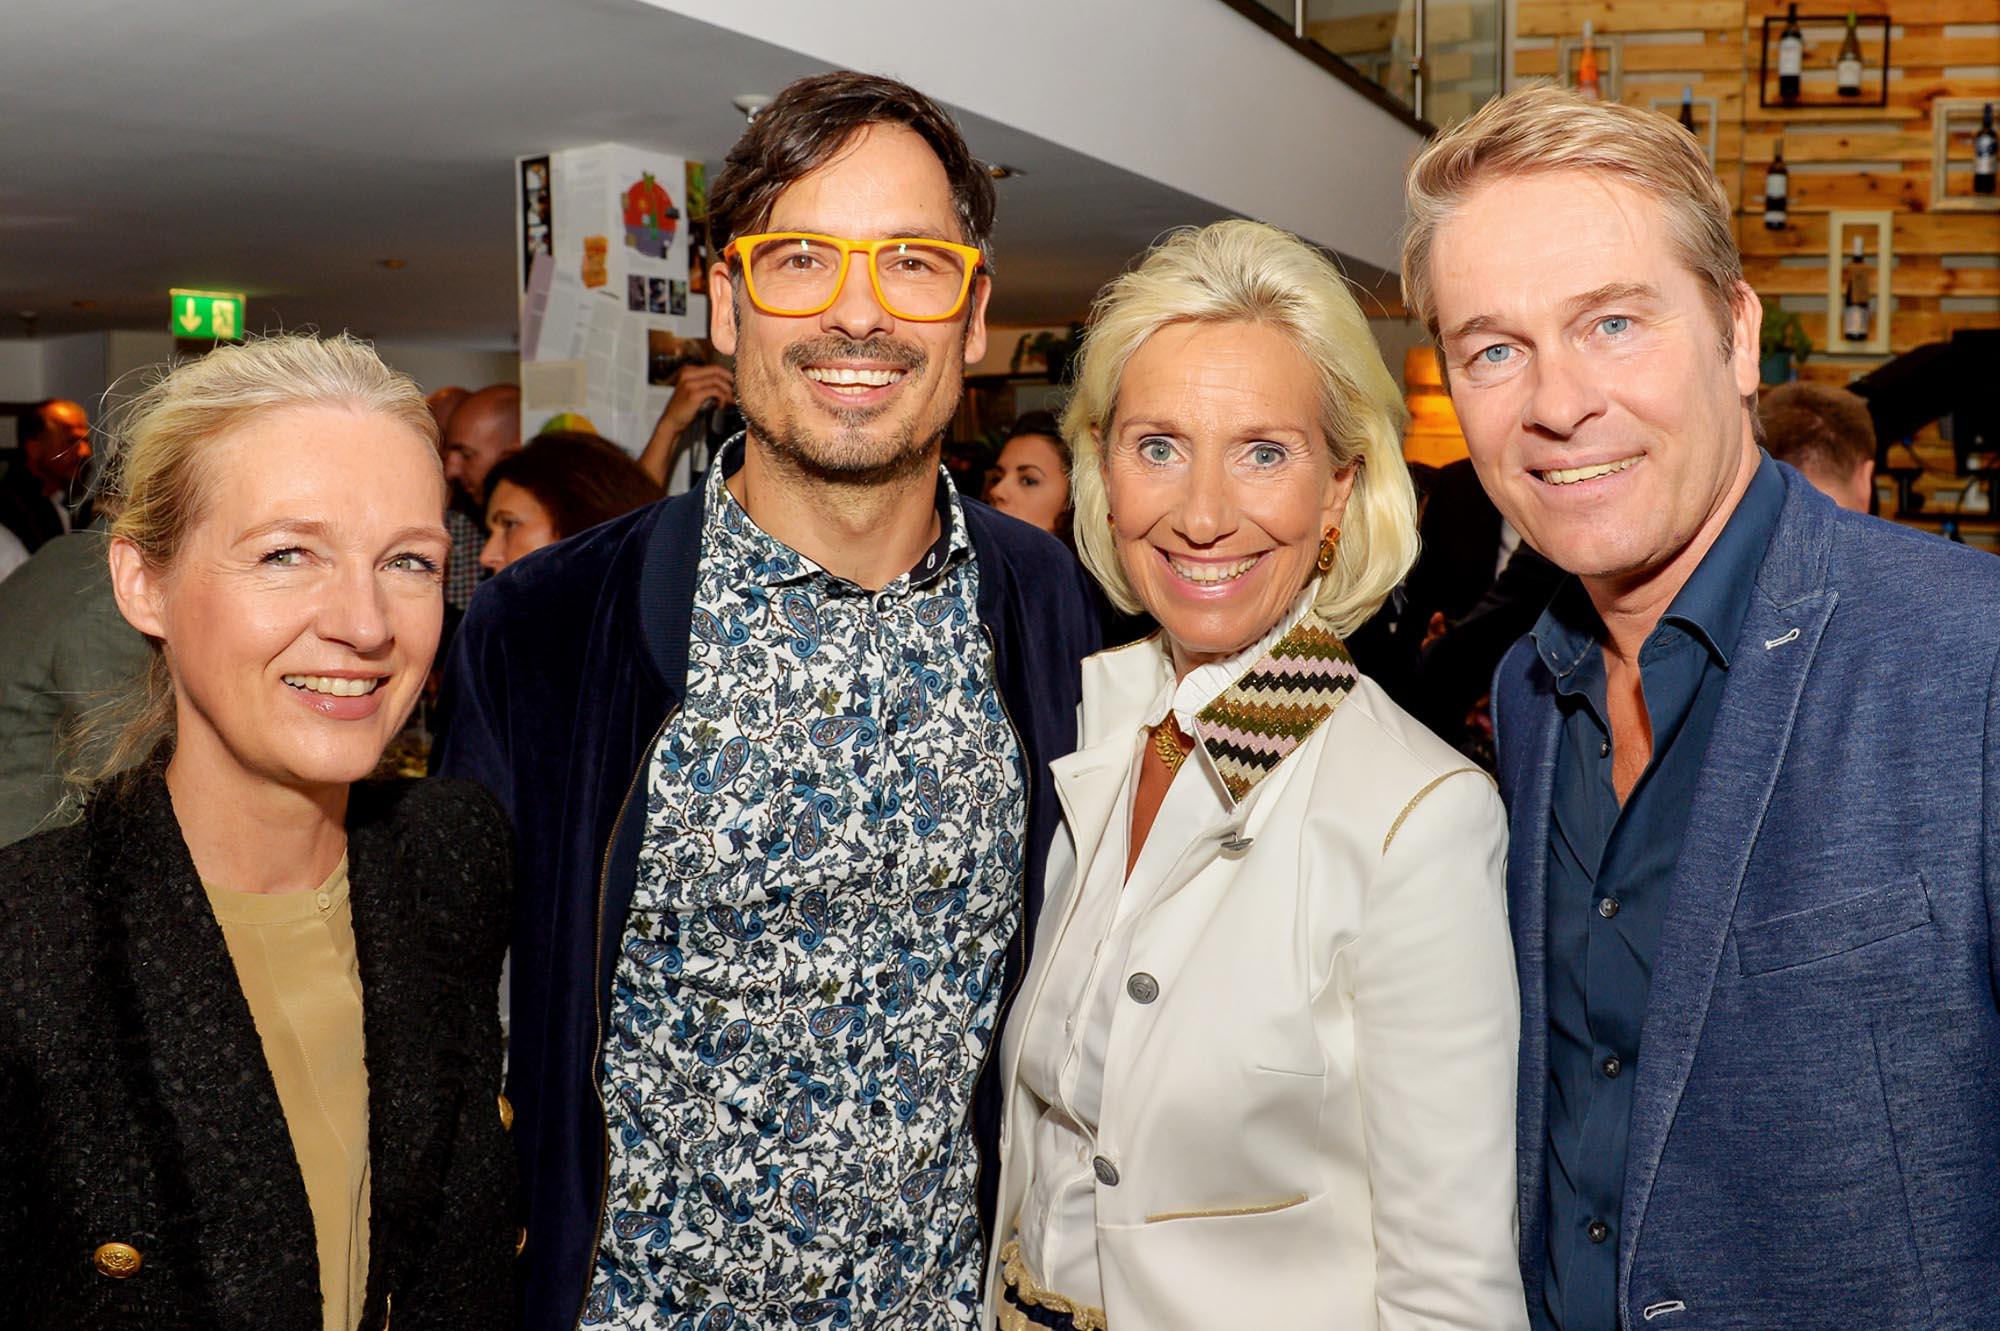 Sabine Menges-Rosowski Nokia, Tim Vogt Speaker, Kristina Tröger CeU-Präsidentin, Hinnerk Baumgarten NDR